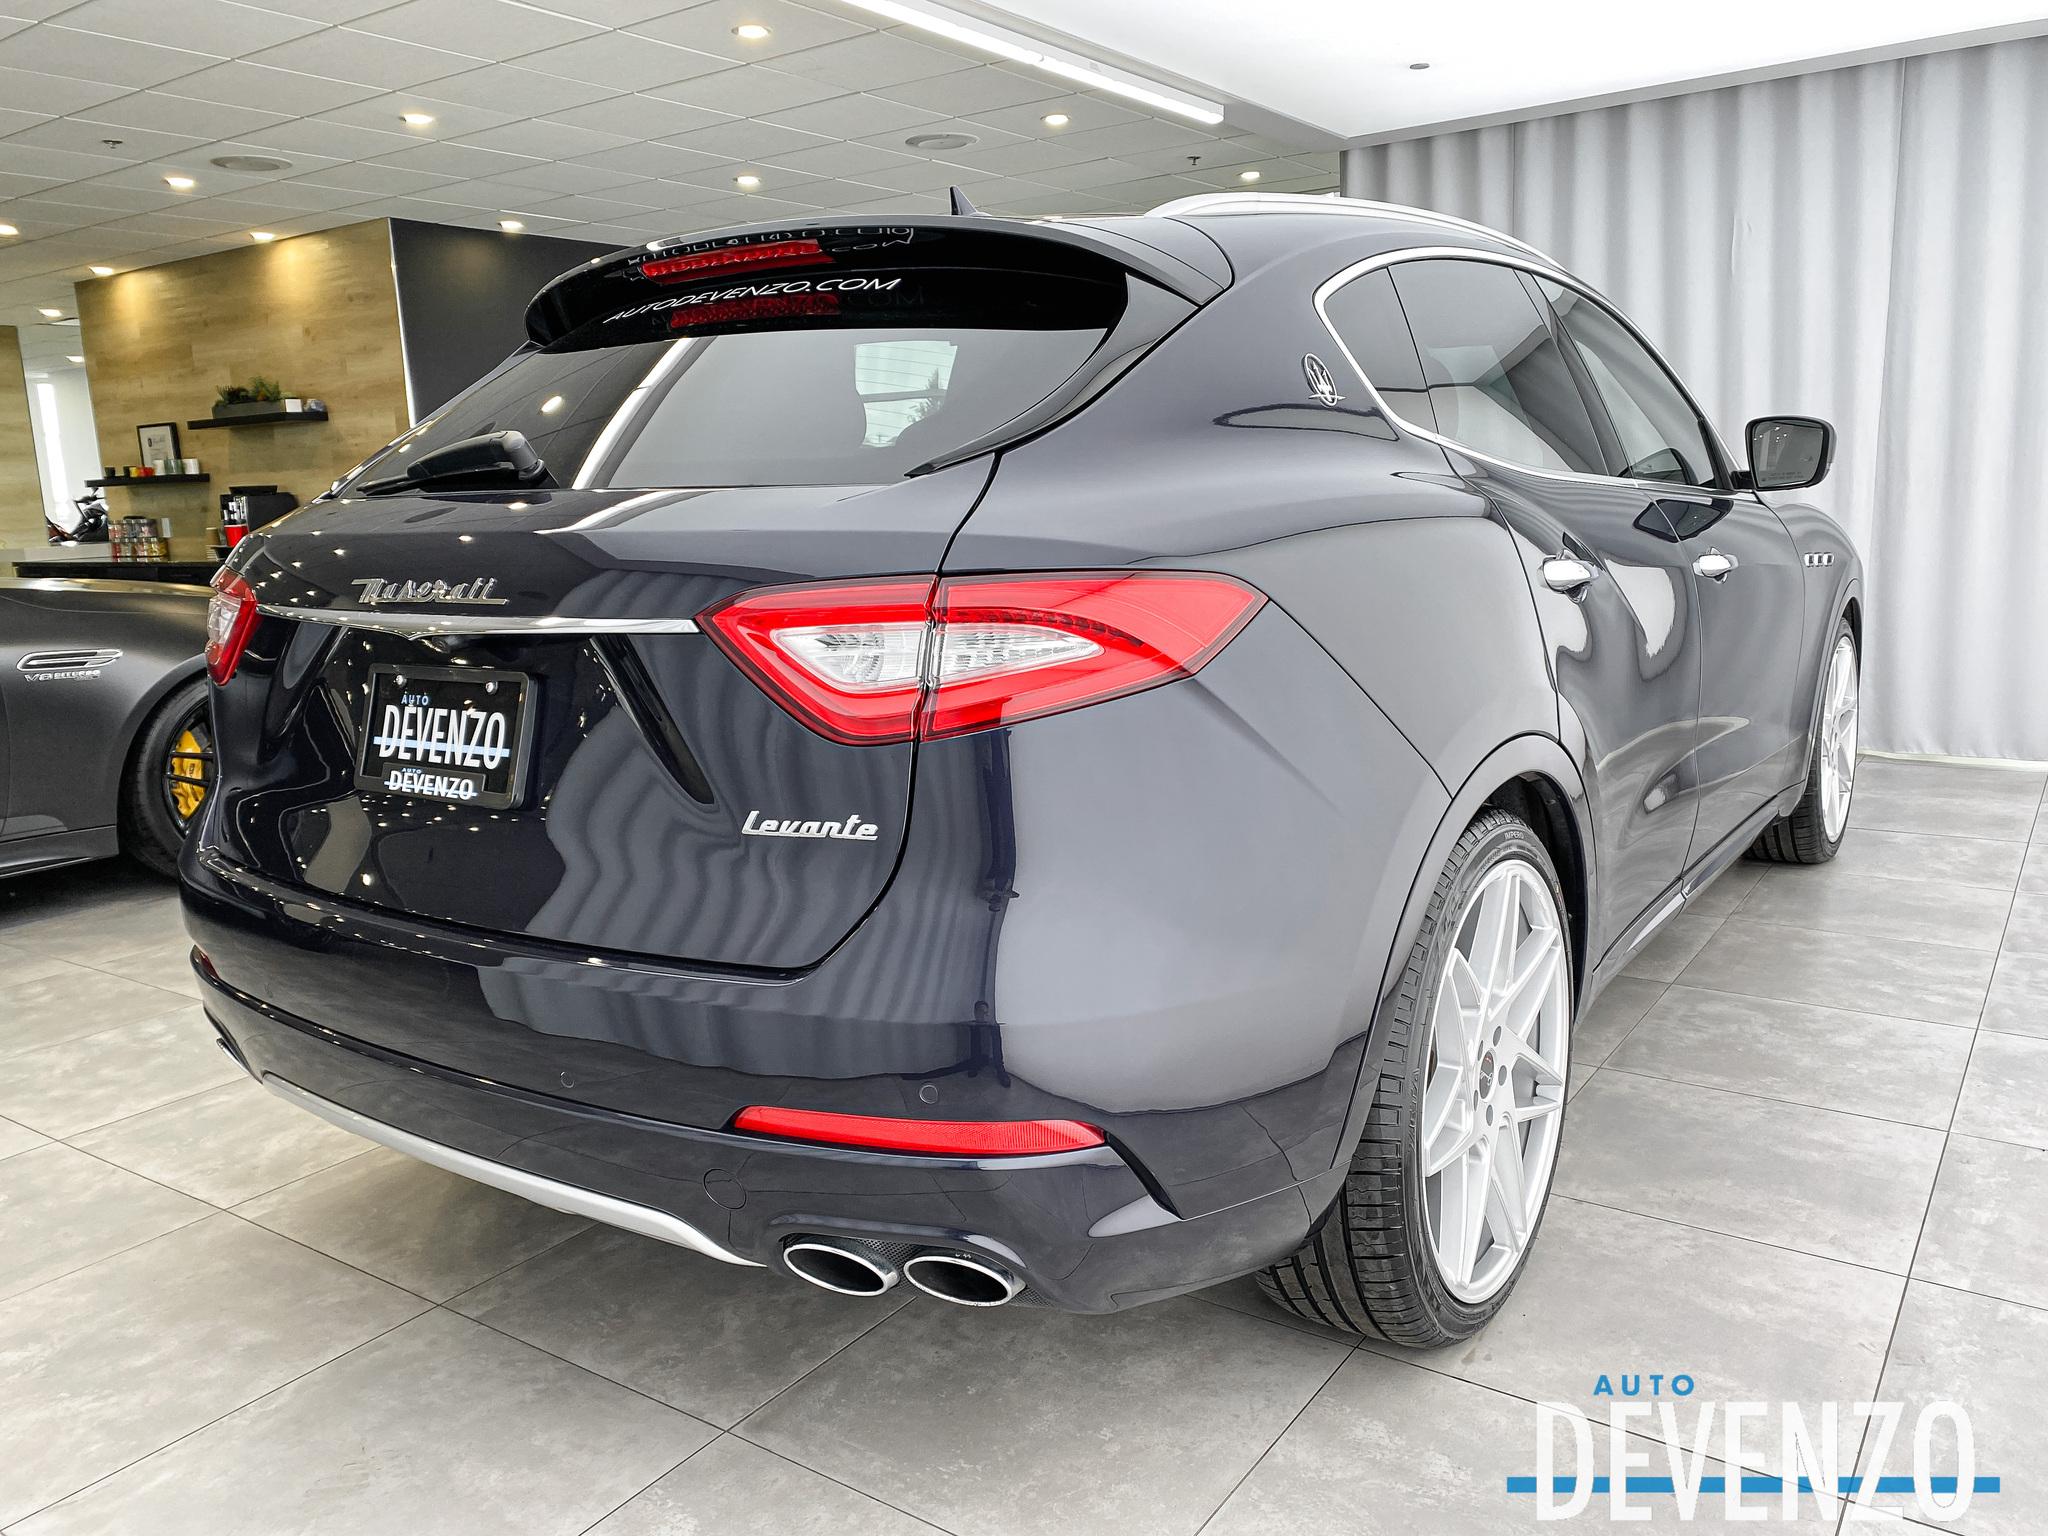 2017 Maserati Levante S Luxury 3.0L AWD 424HP Low Mileage Gem complet